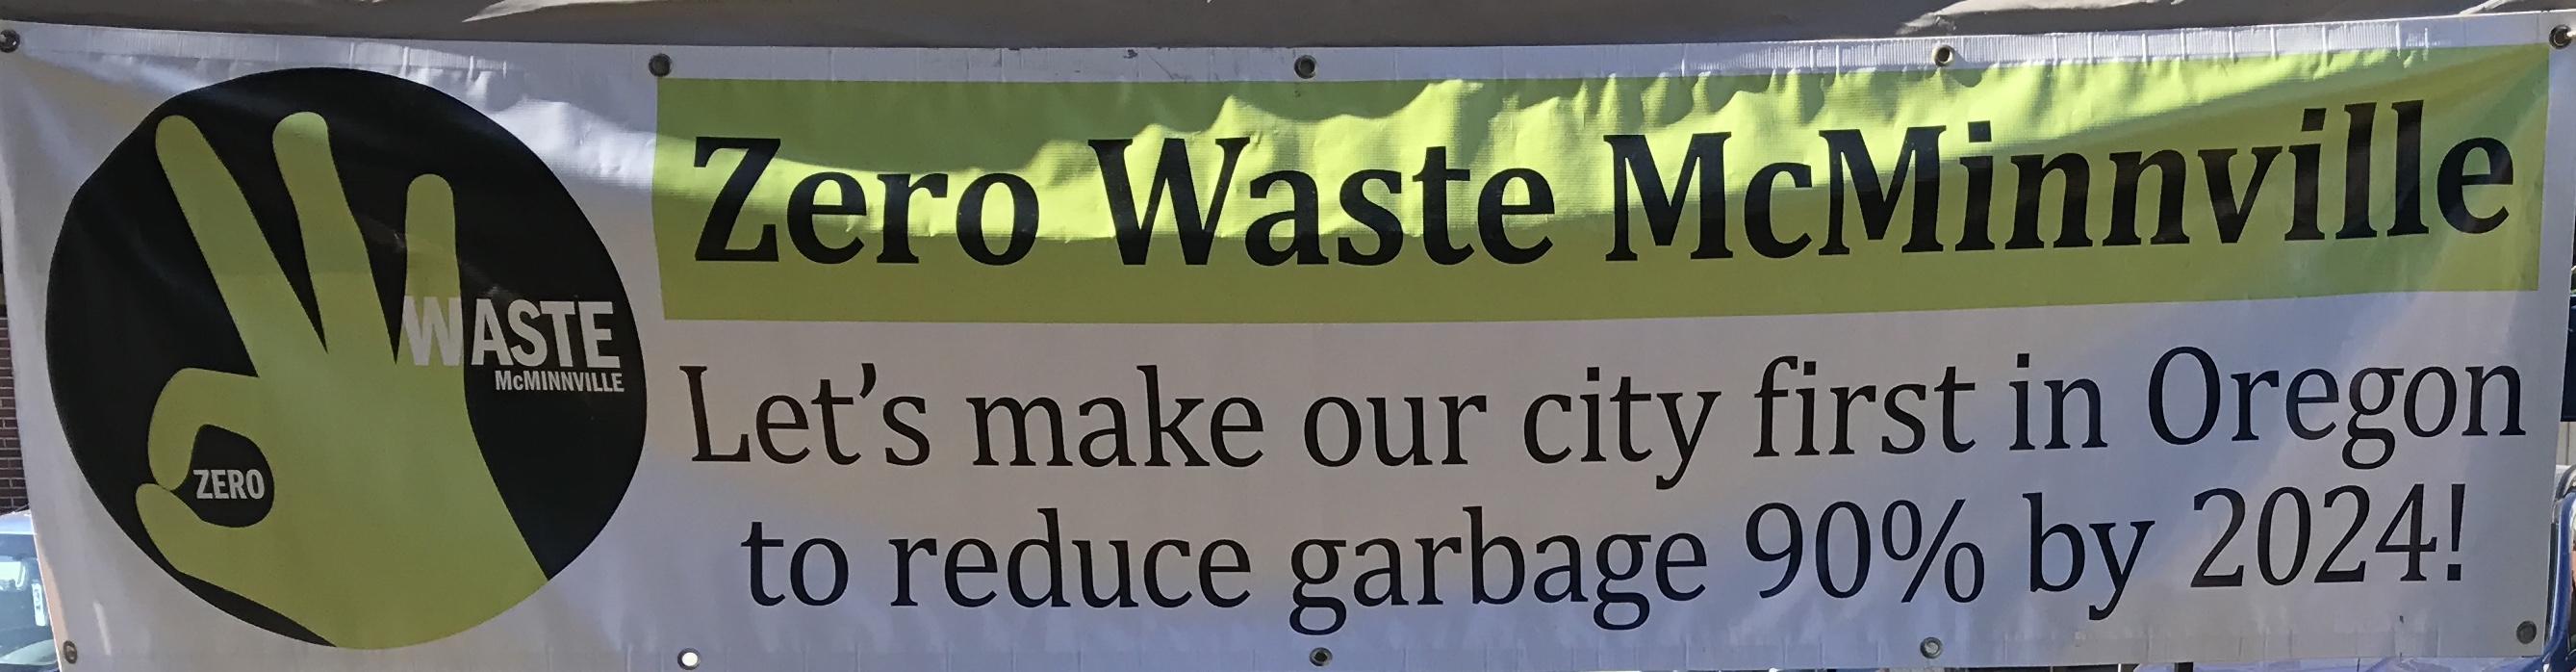 Zero Waste McMinnville